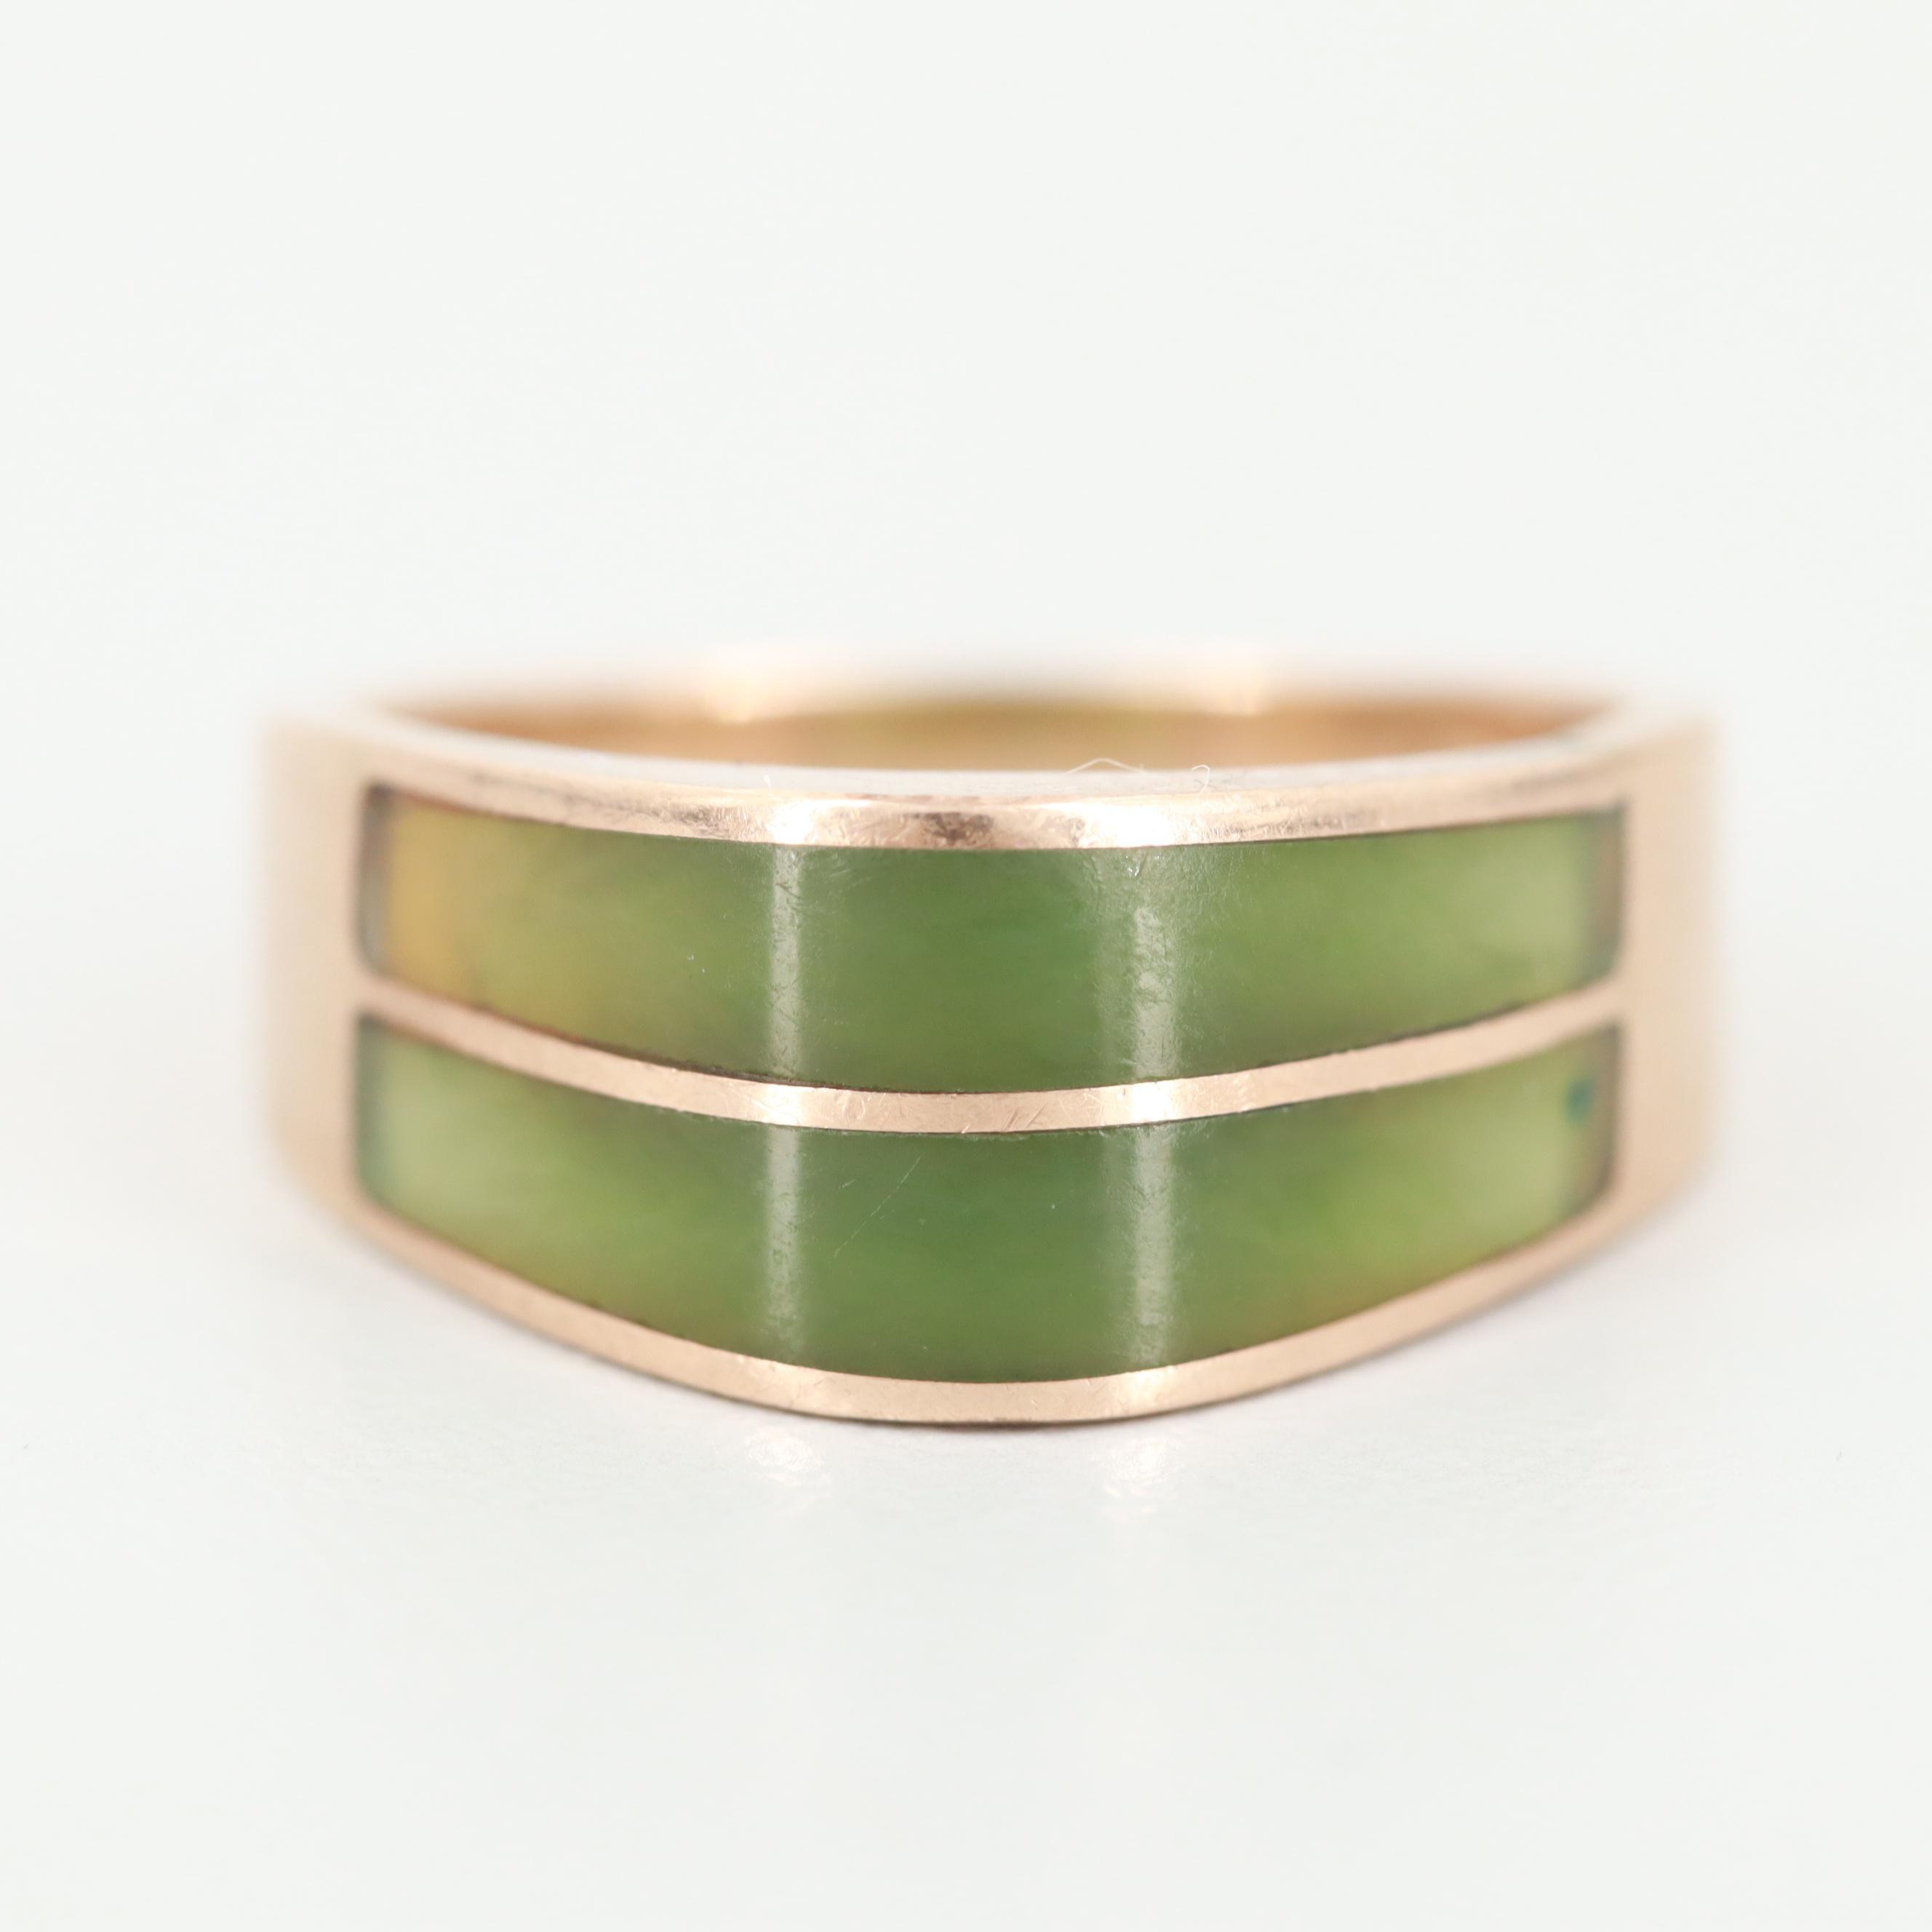 Modernist 10K Yellow Gold Nephrite Inlay Ring